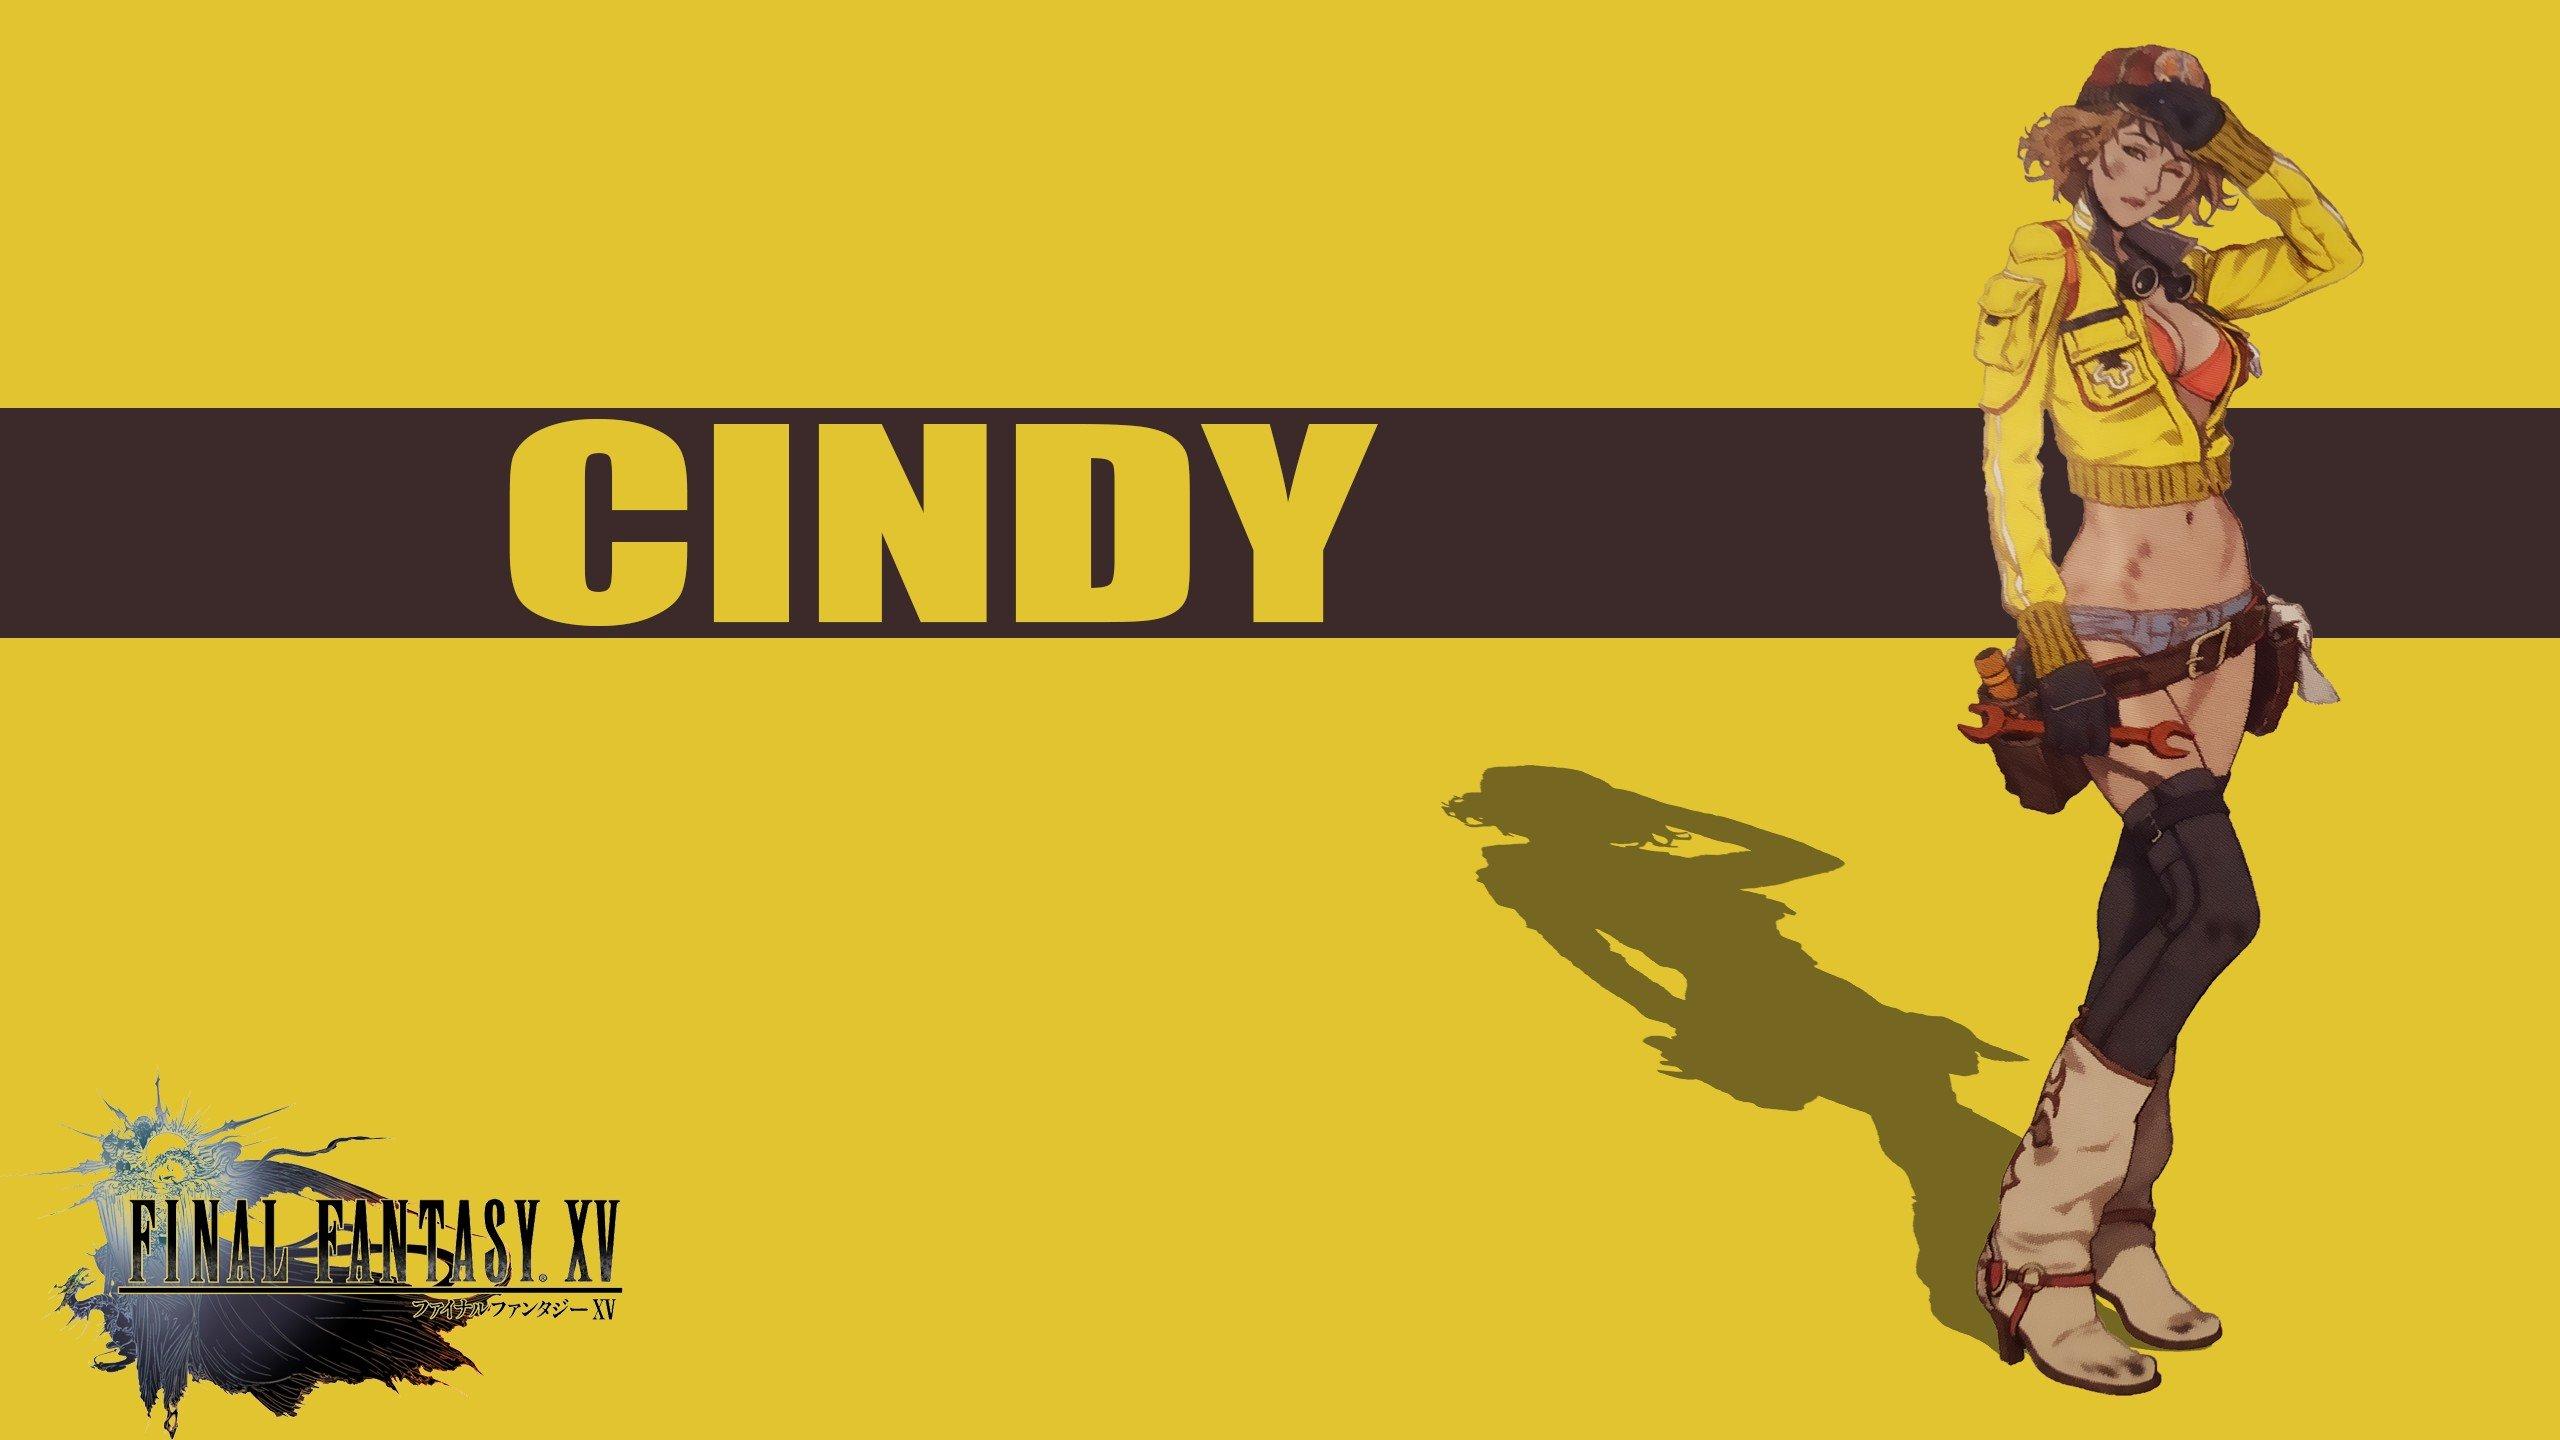 Final Fantasy Xv Cindy Mechanics Hd Wallpapers Desktop And